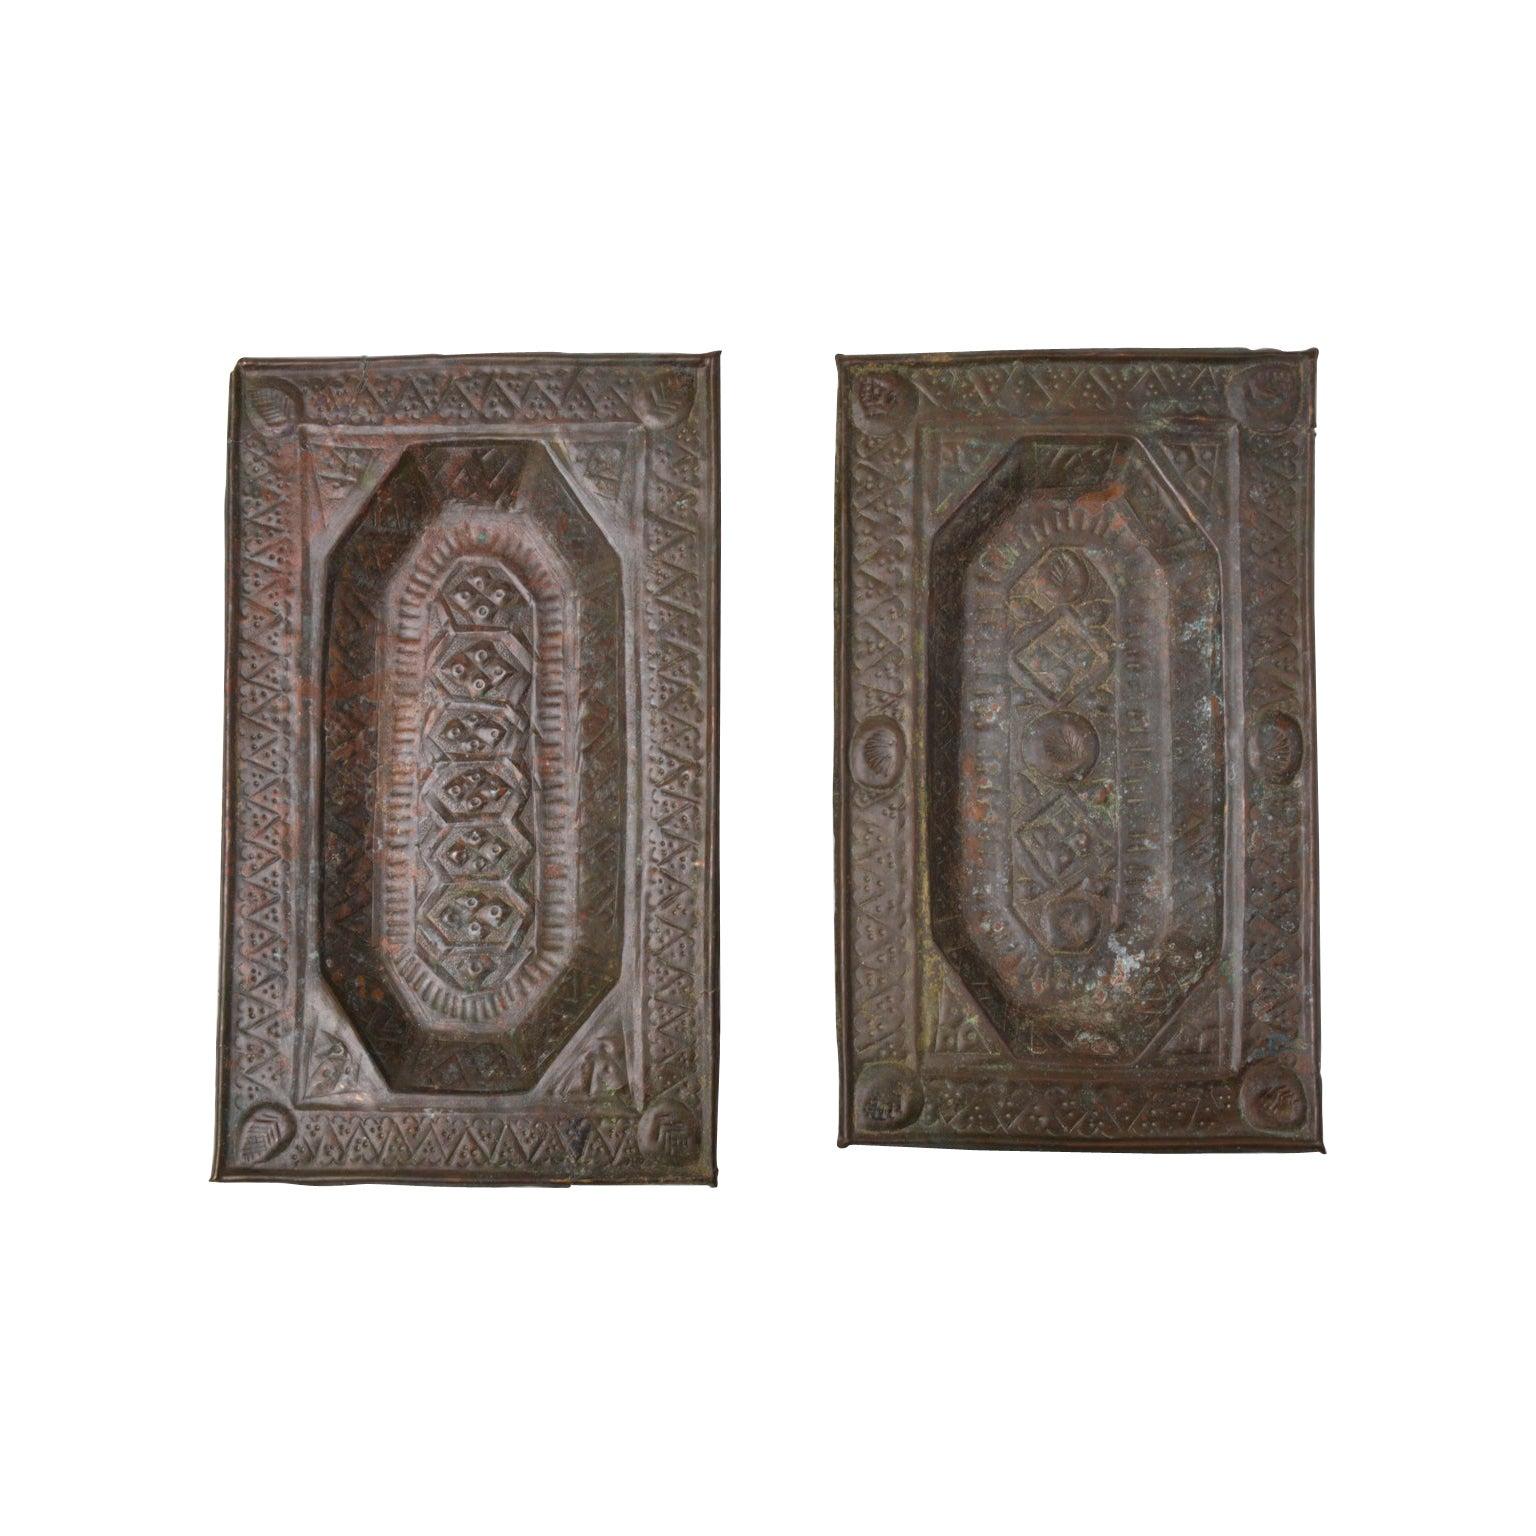 Antique Rare Samarkand or Bokara Almoner Trays